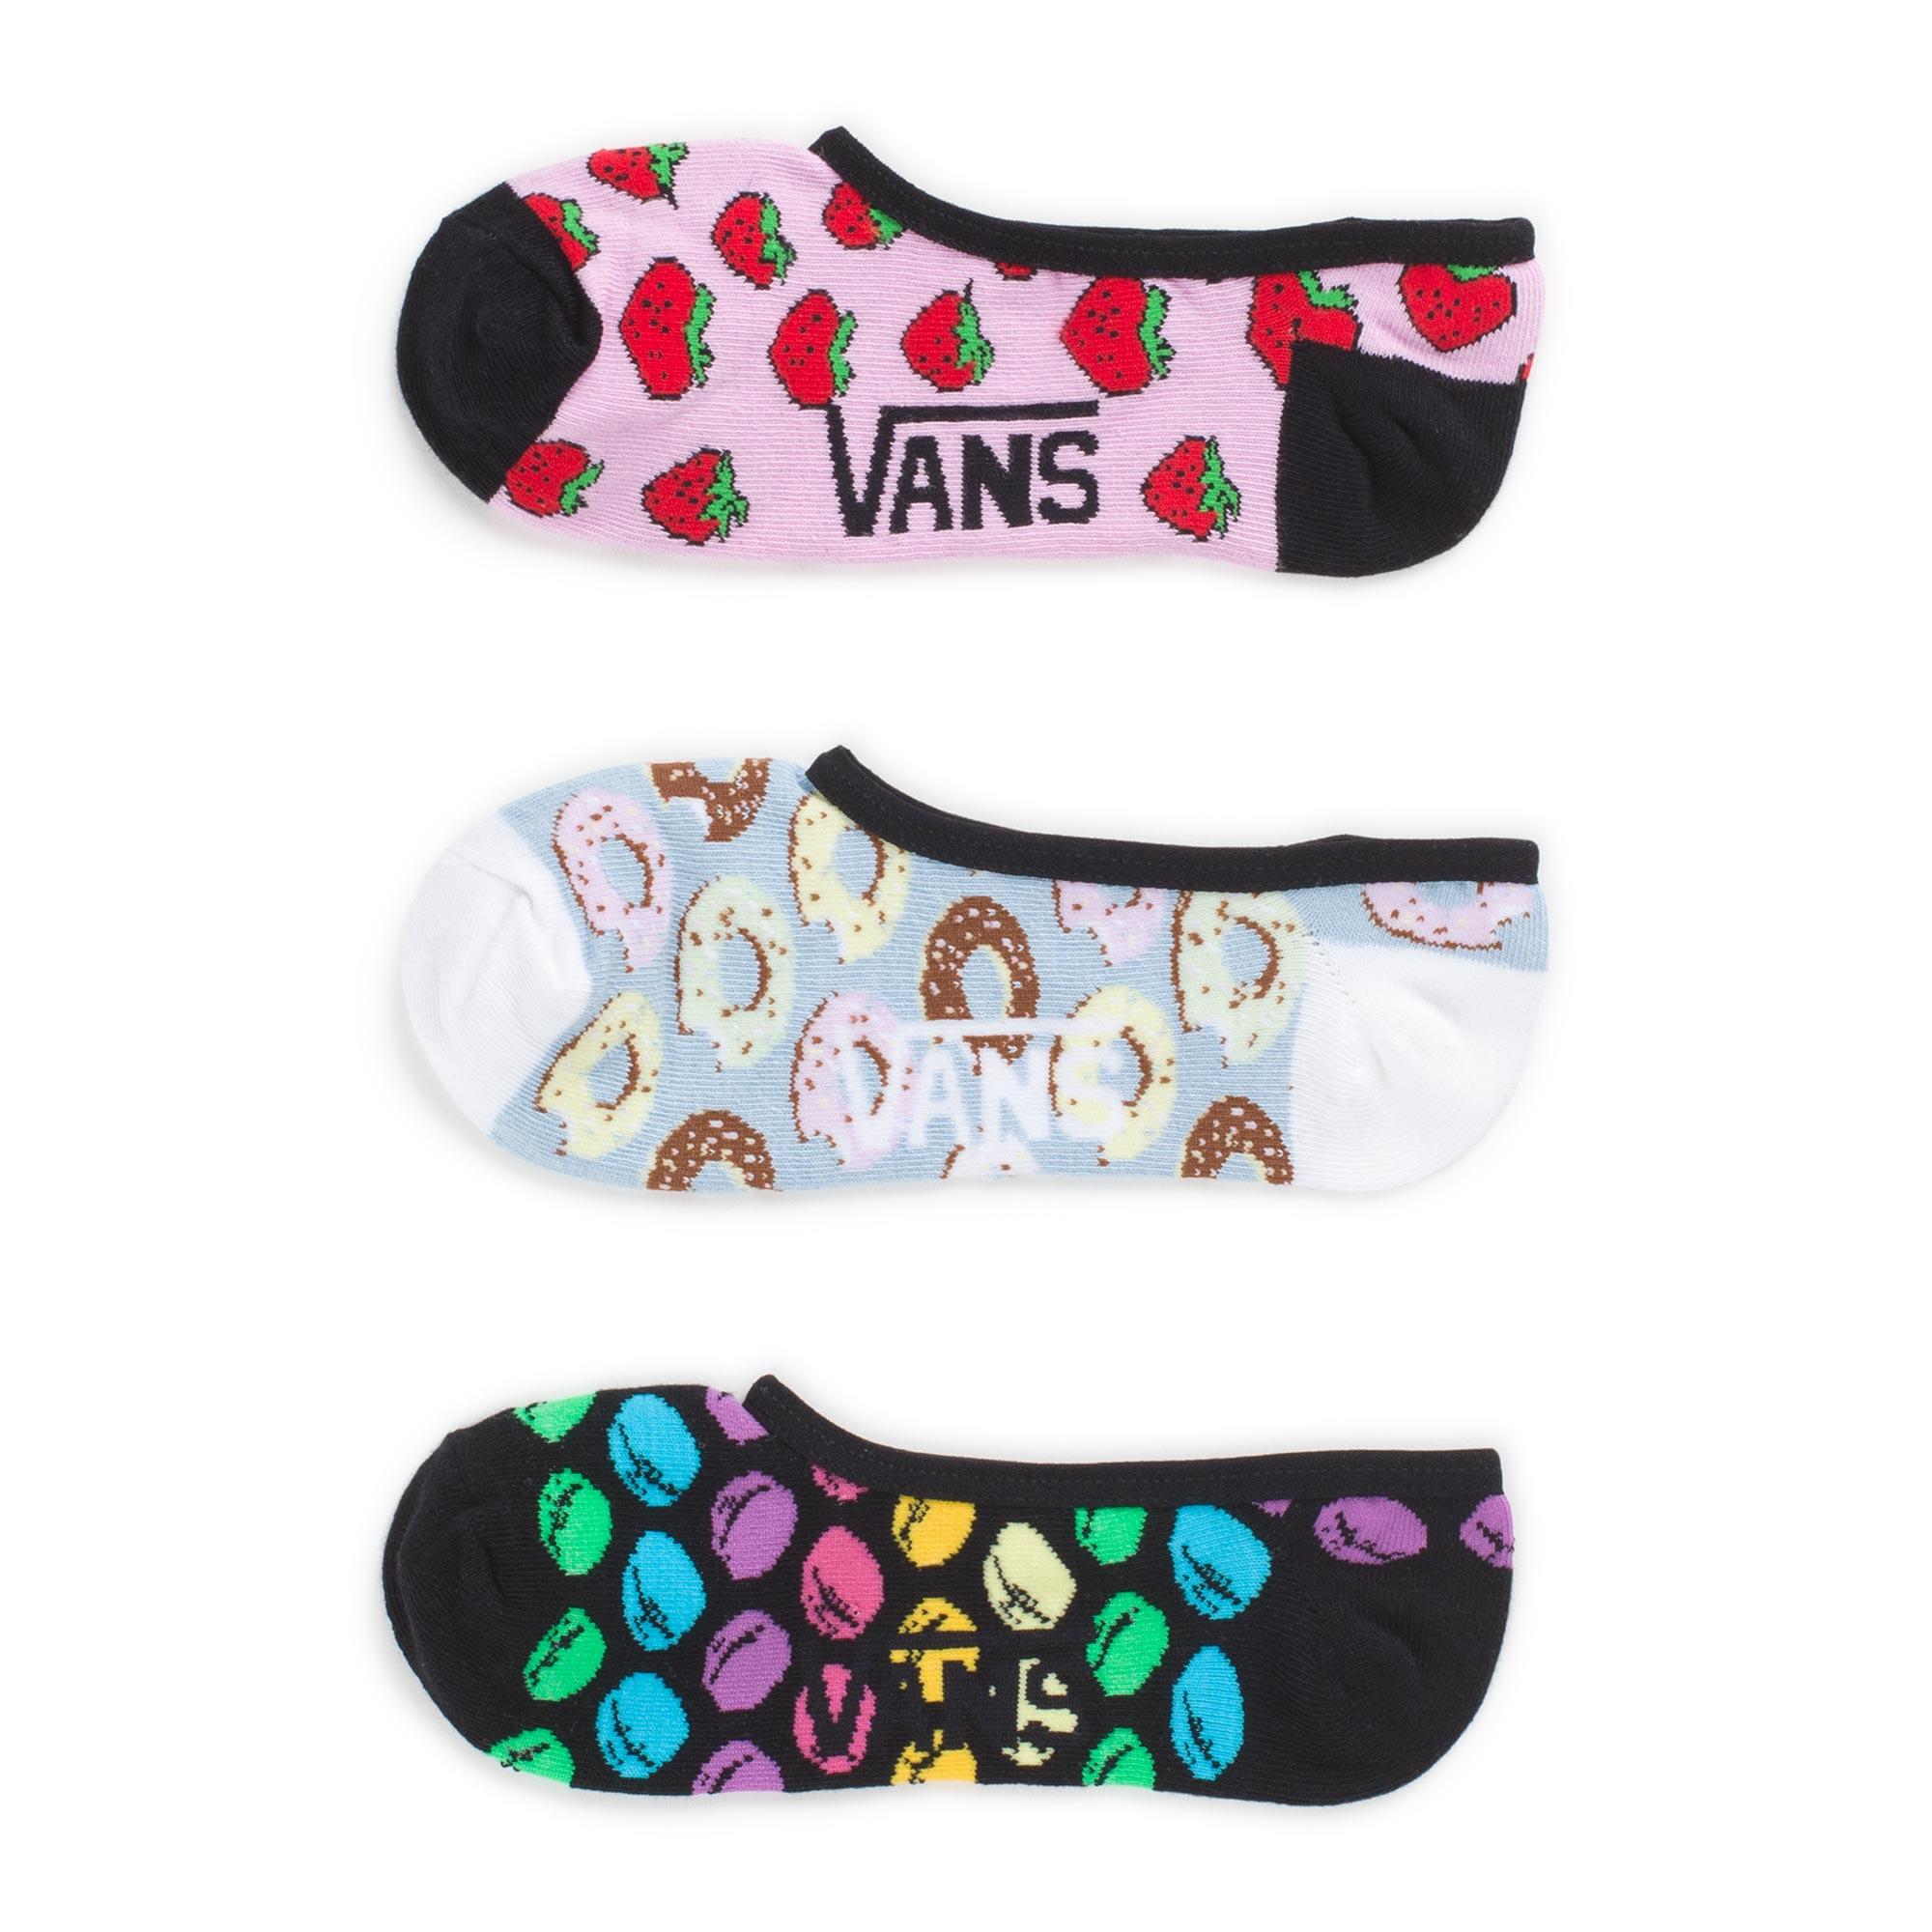 Носки Midnight Snack Pack Canoodles Socks (упаковка по 3 пары)